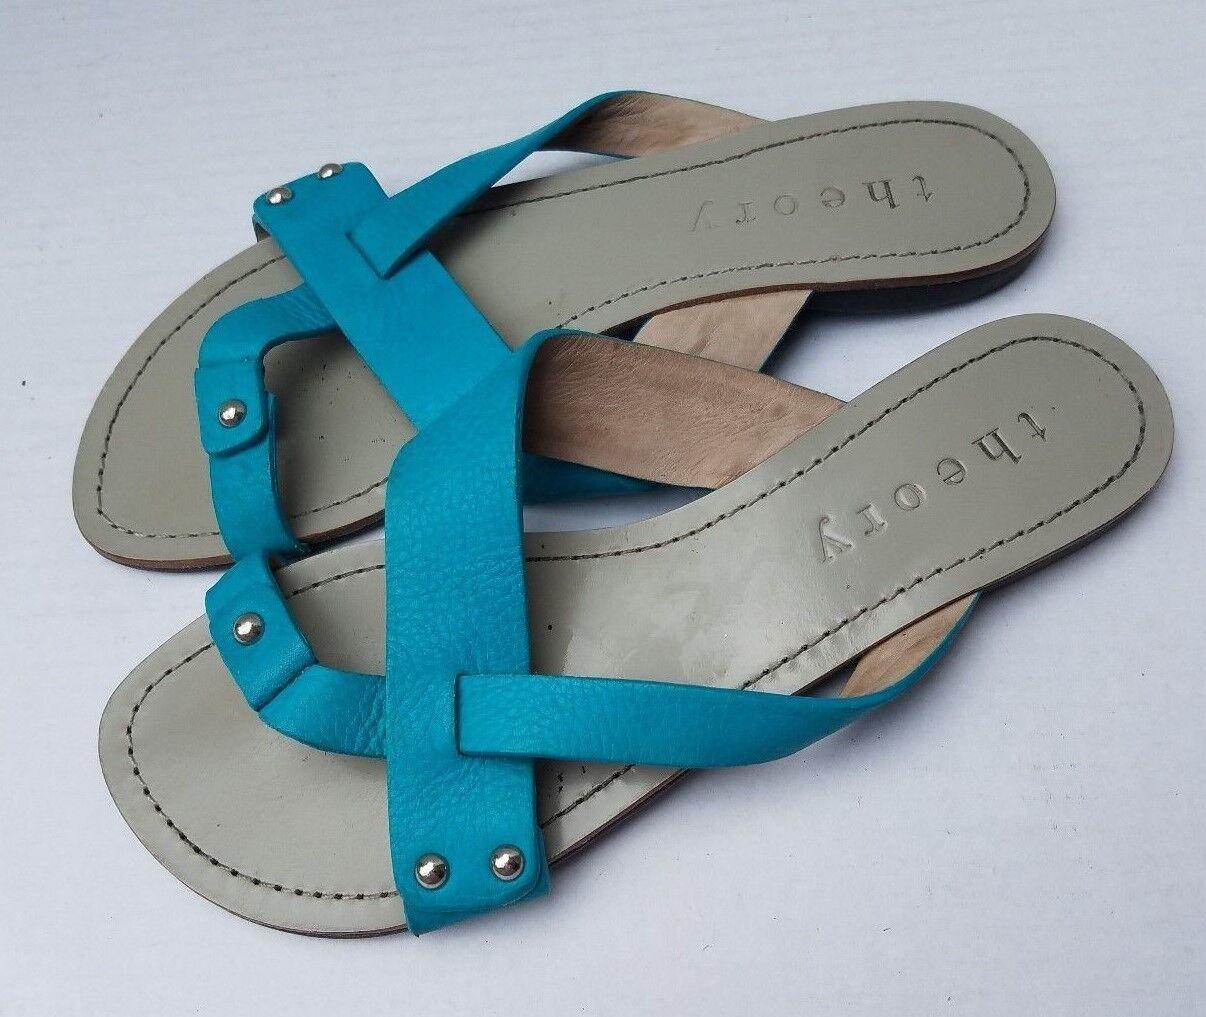 theory Toe Flat Sandales Leder Slip On Teal Blau Damenschuhe 38 Flip Flops Brazil